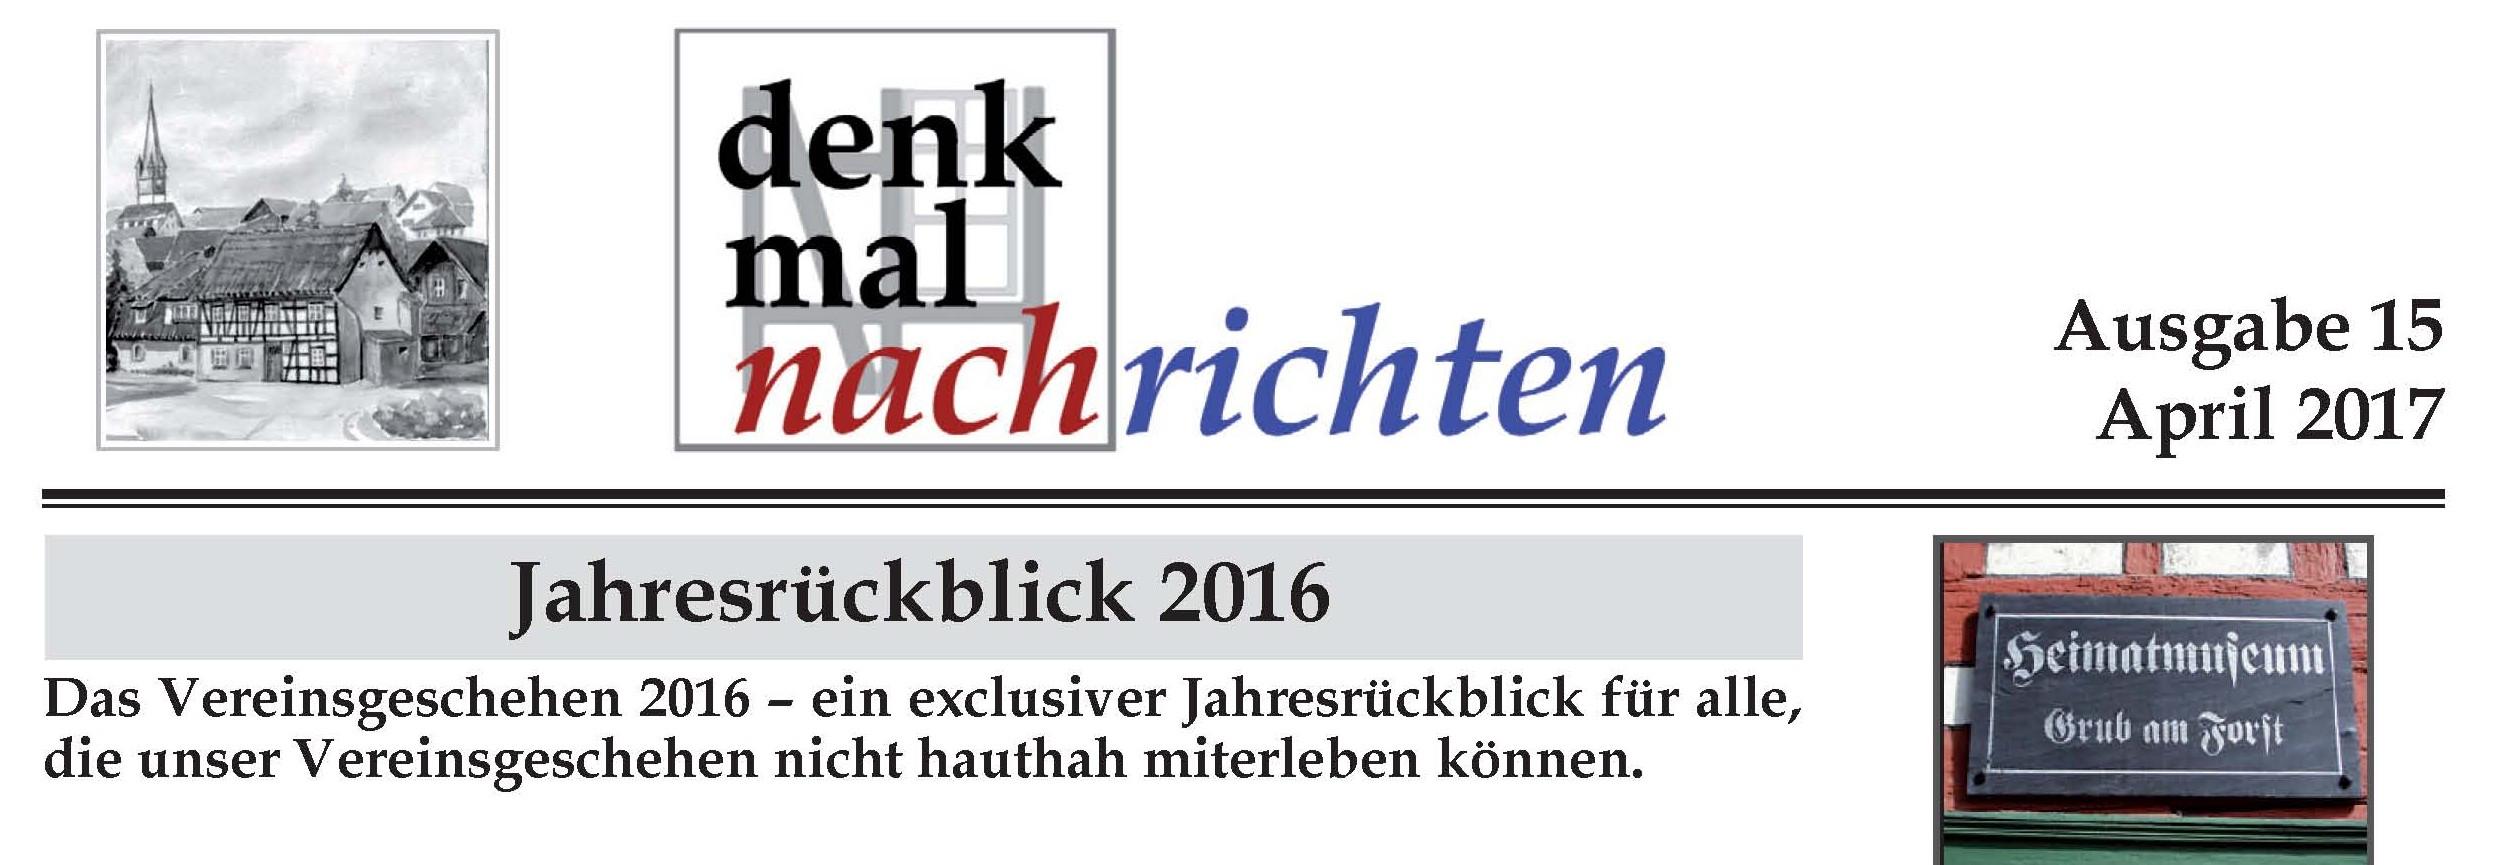 "Denkmalnachricht ""dmn"" 2017 ist da!"